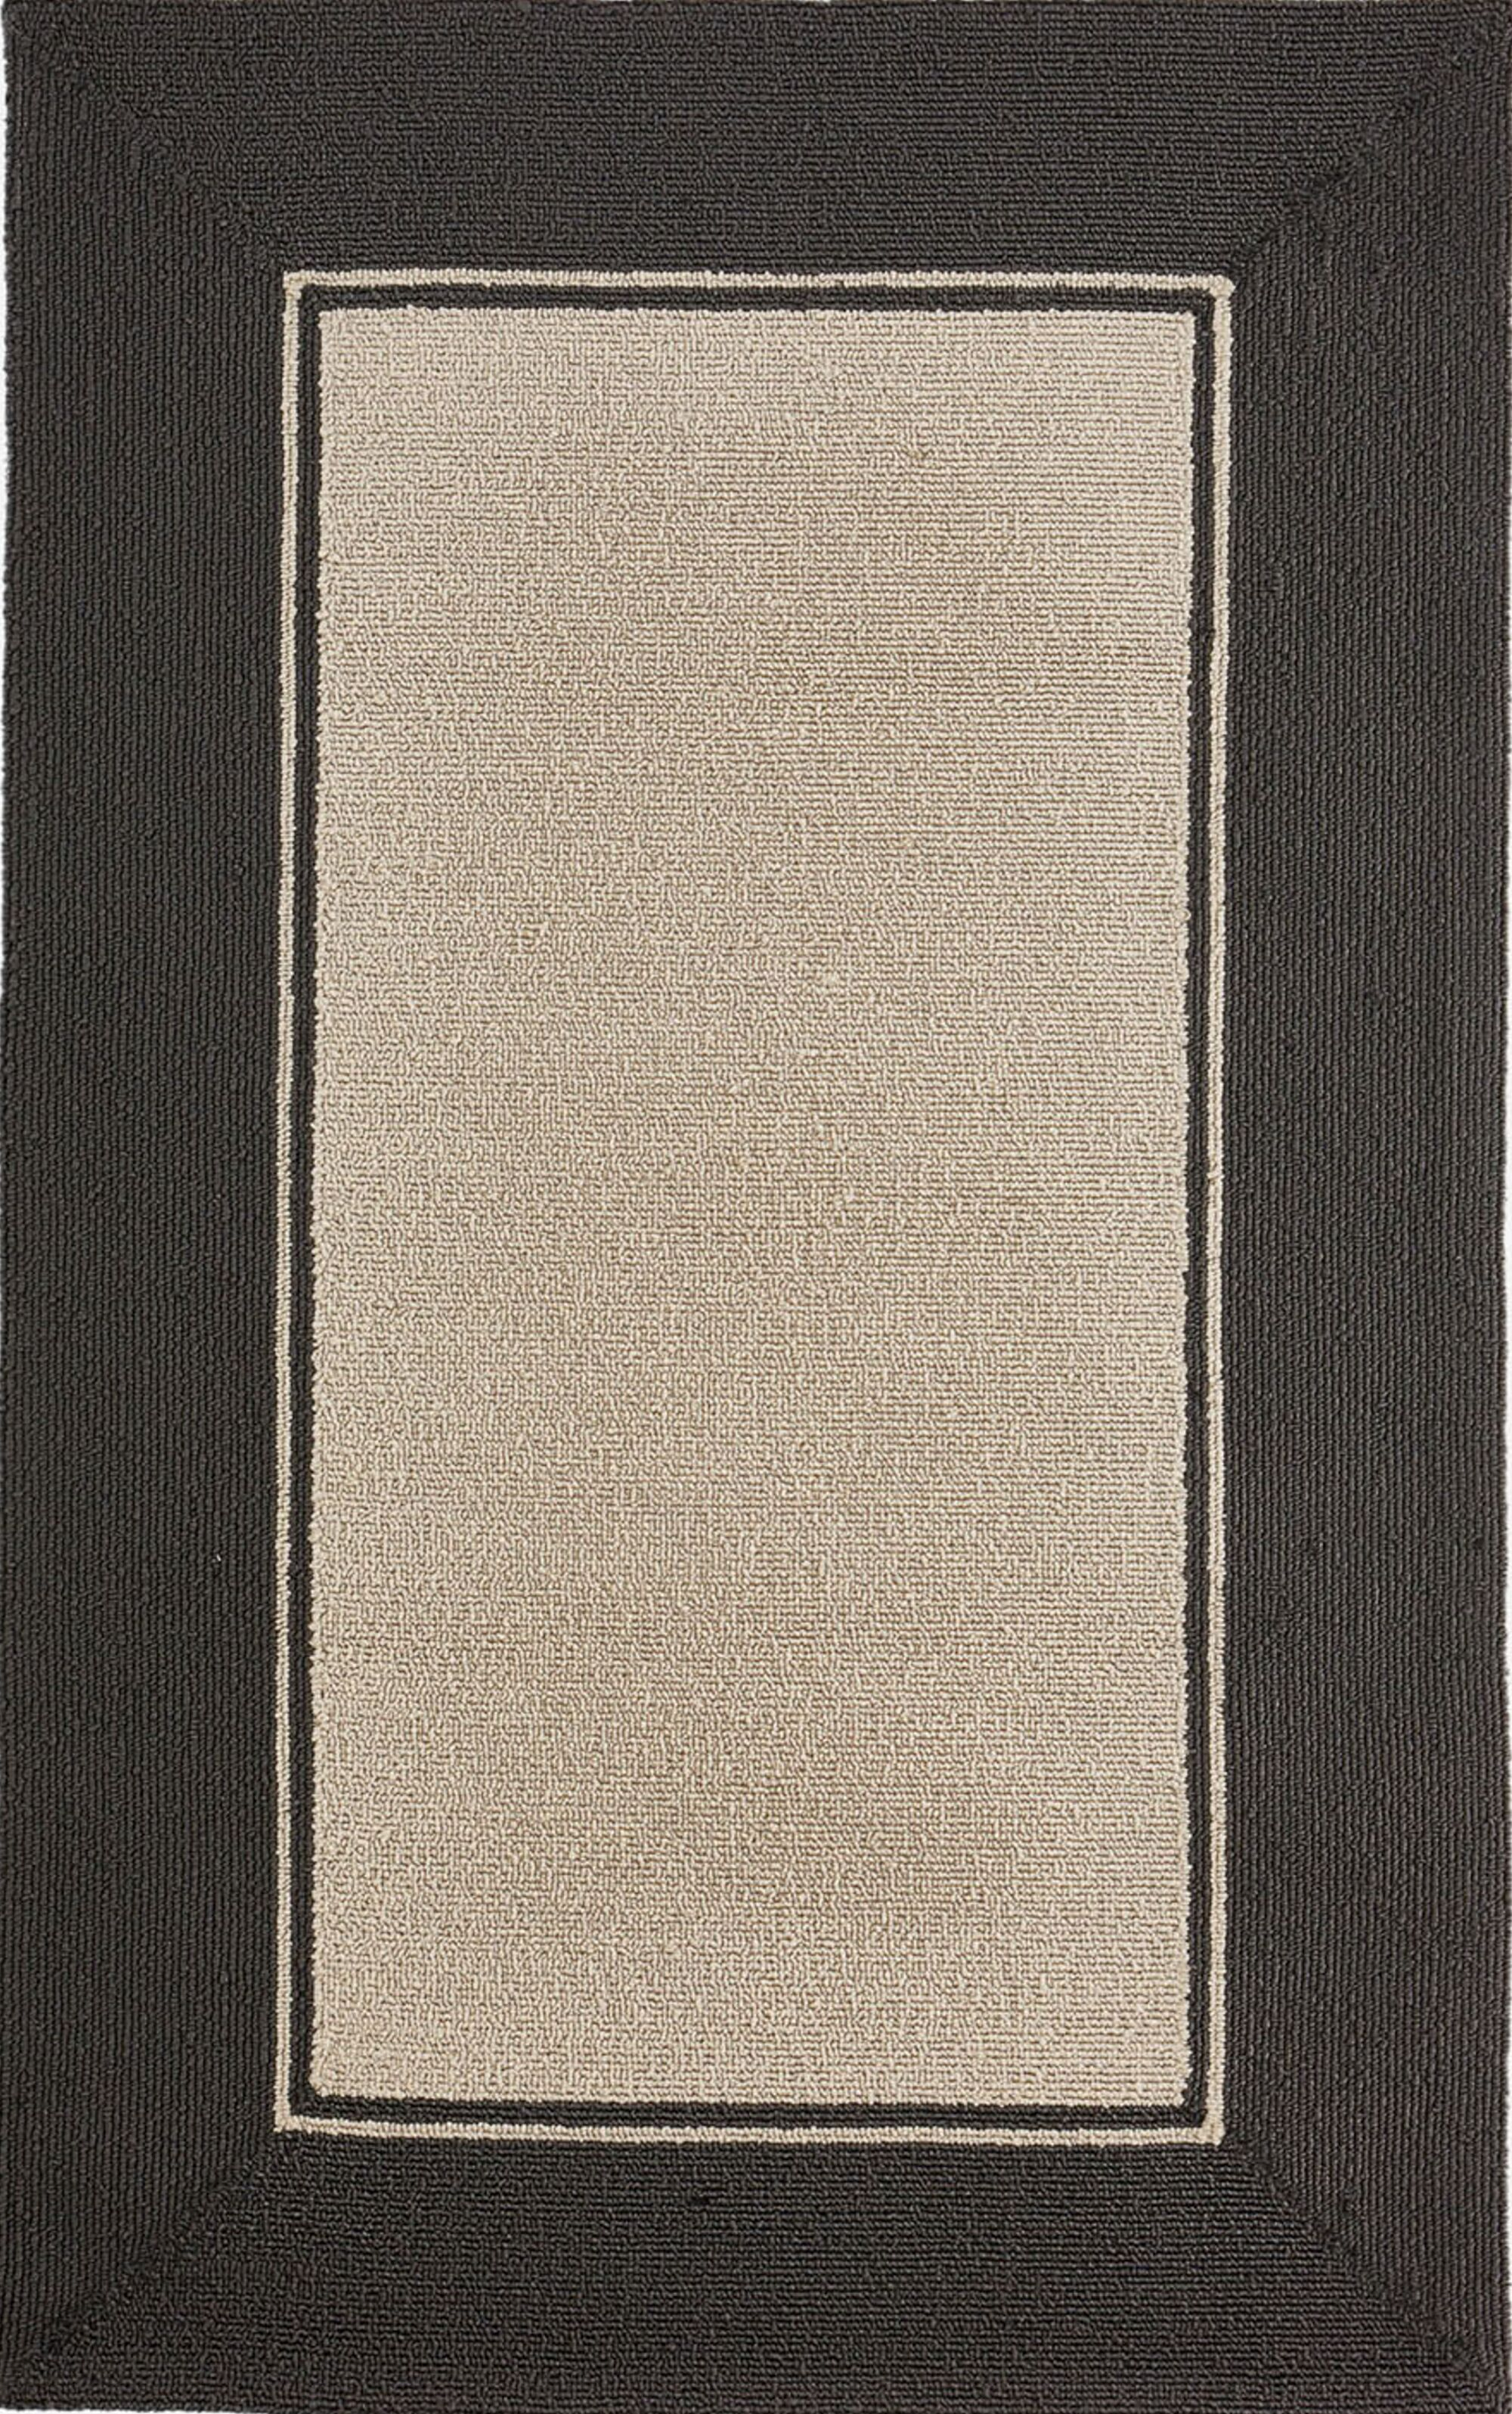 Enoch Border Hand-Woven Black Indoor/Outdoor Area Rug Rug Size: Rectangle 3'6